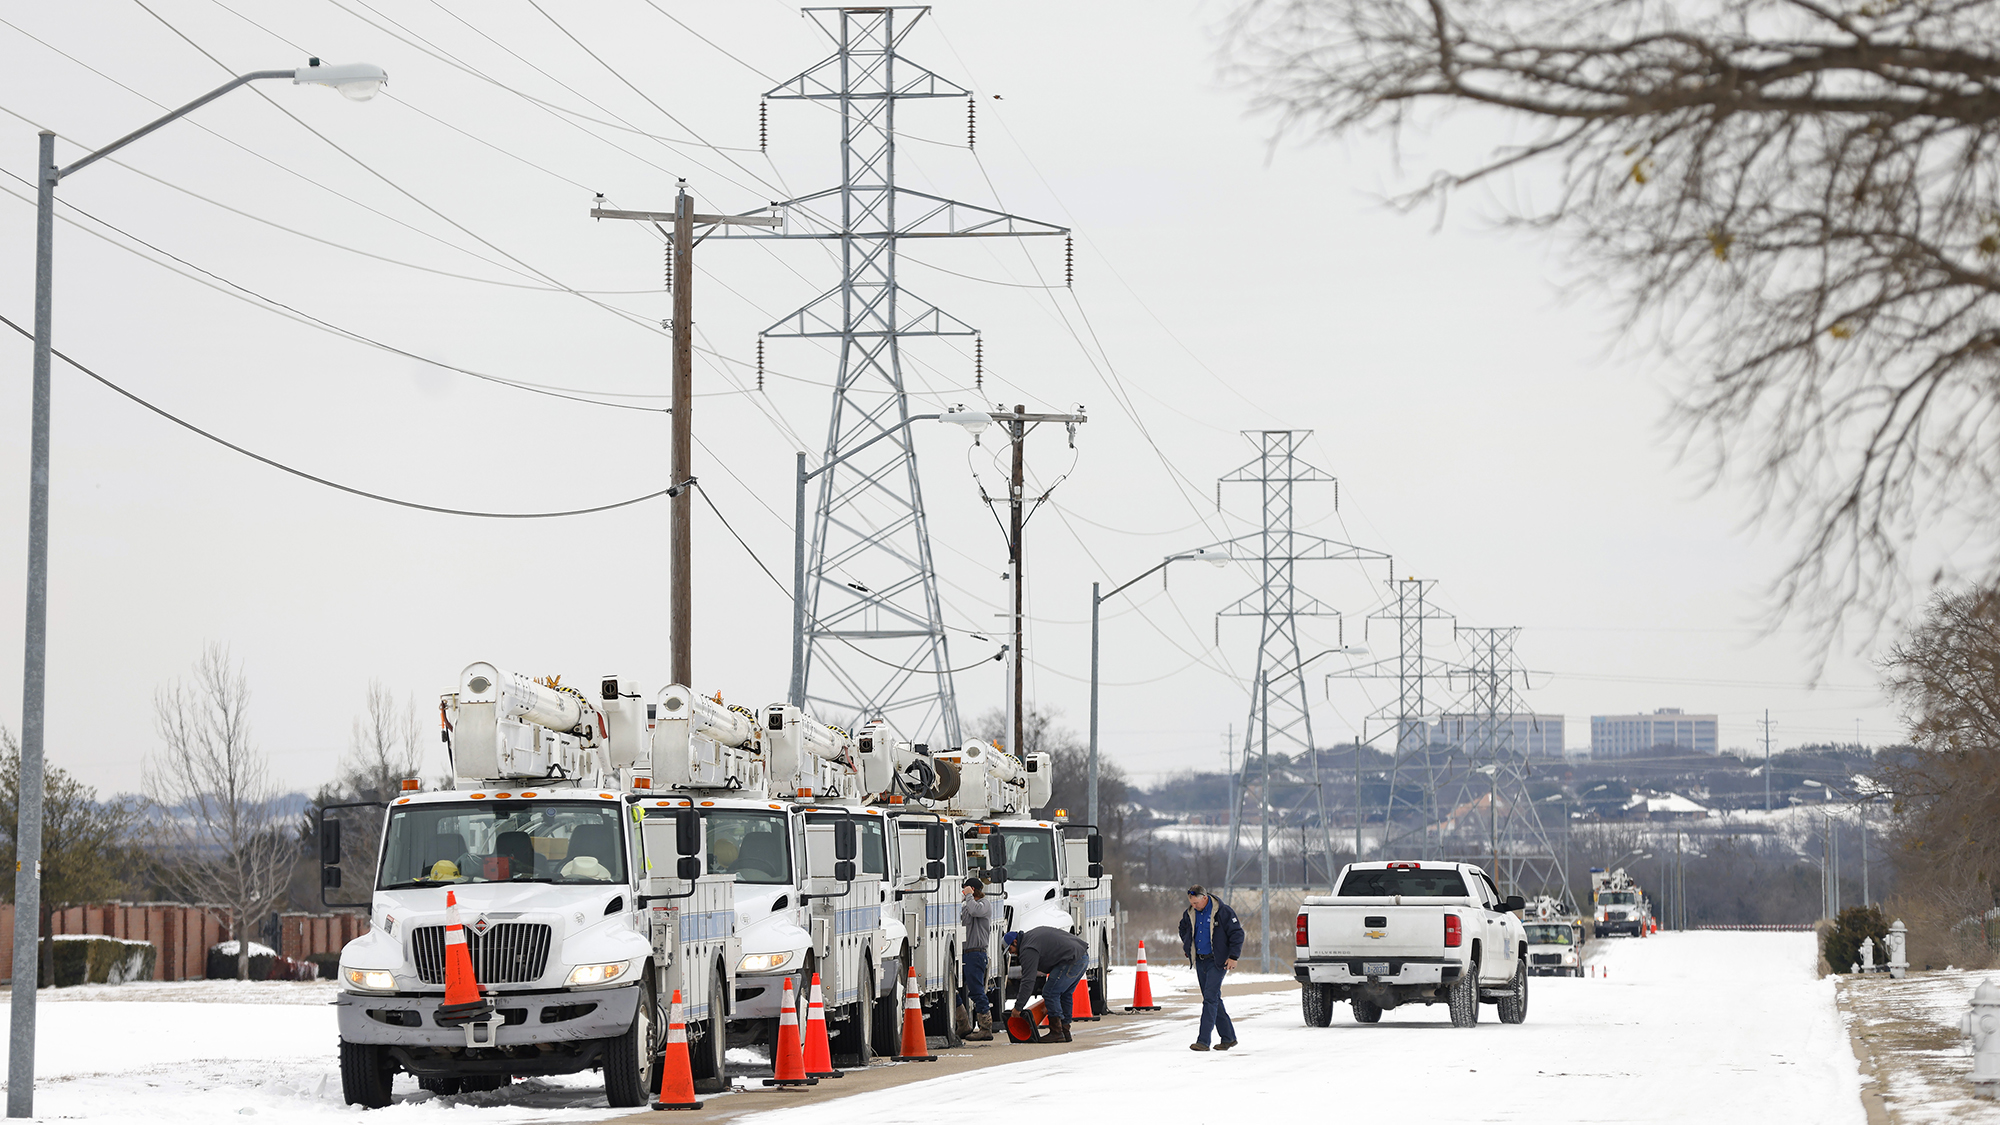 As Texas went dark, Fox News blamed windmills